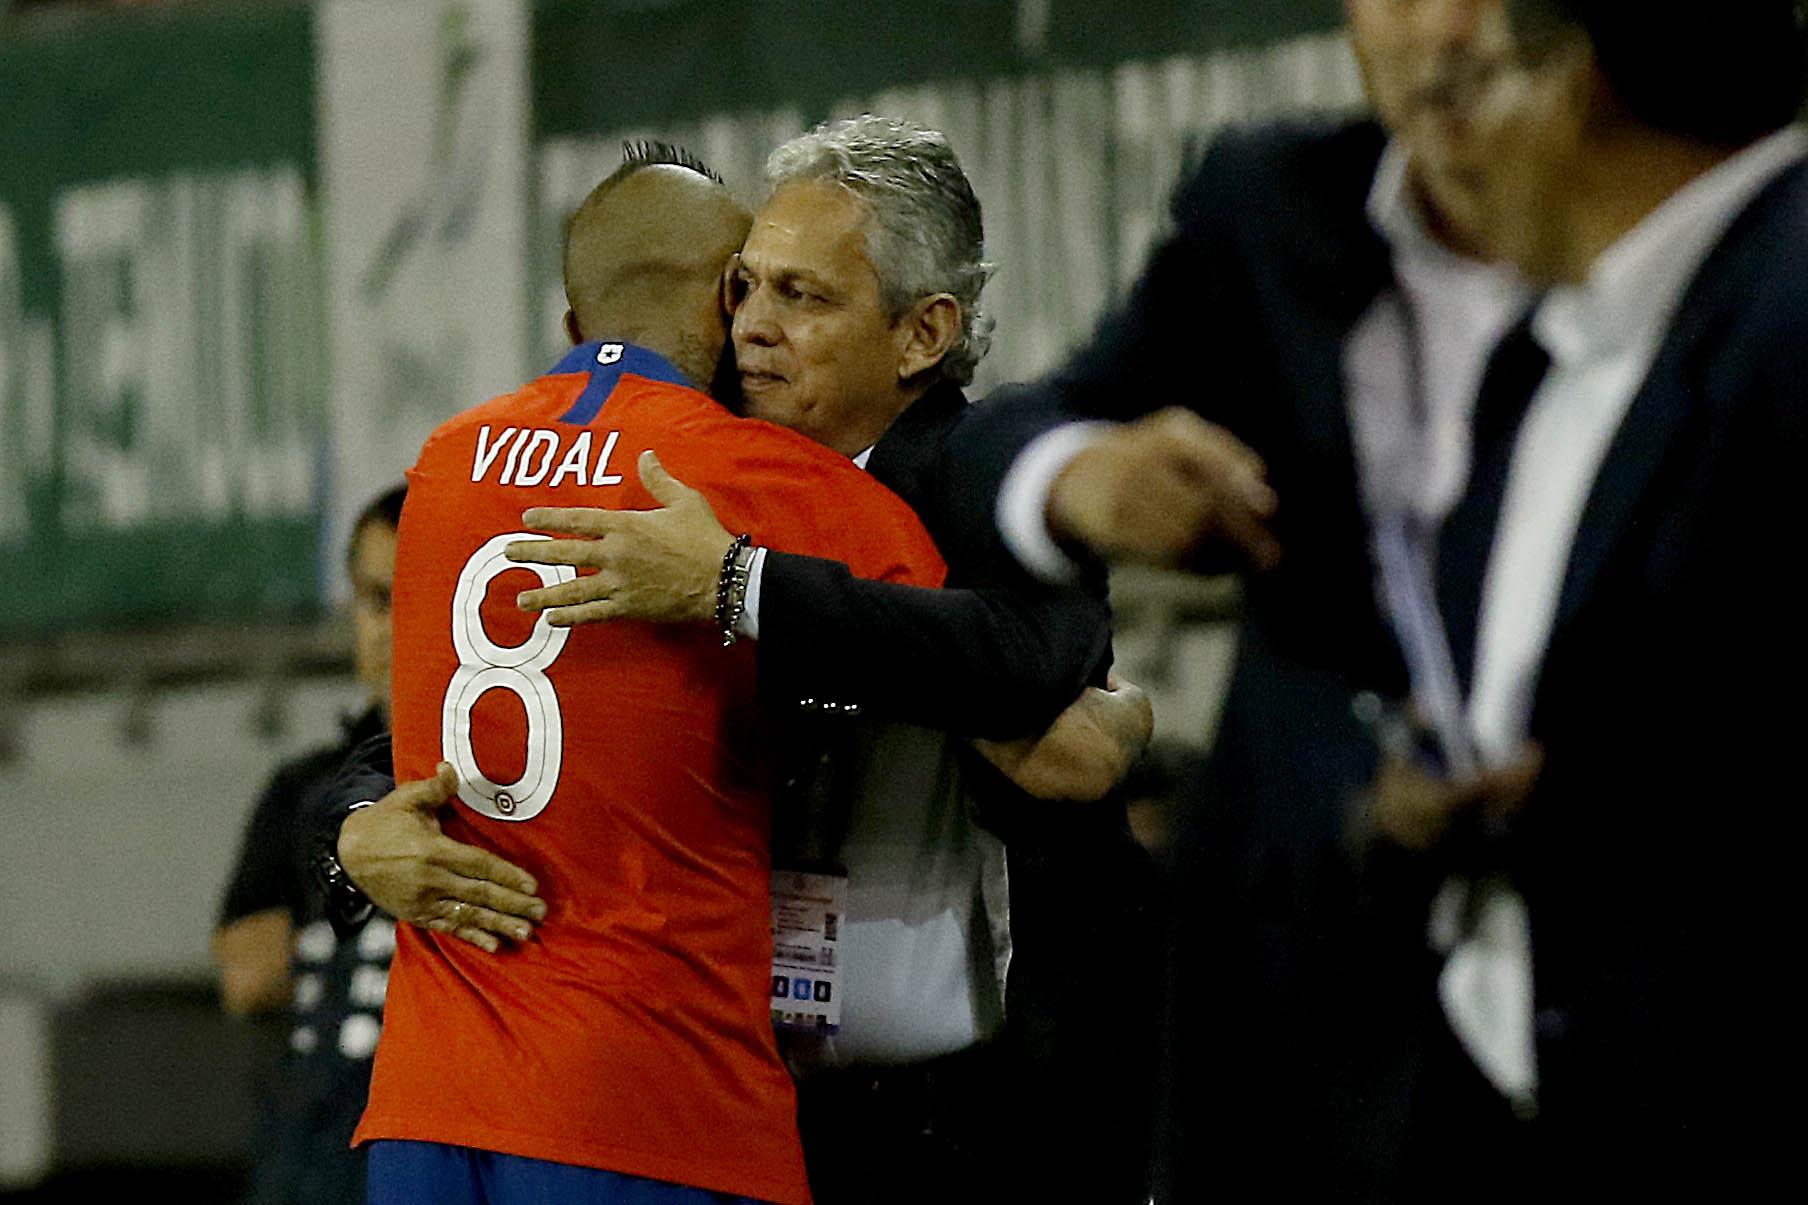 Arturo Vidal abraza a Reinaldo Rueda   Leonardo Rubilar   Agencia UNO